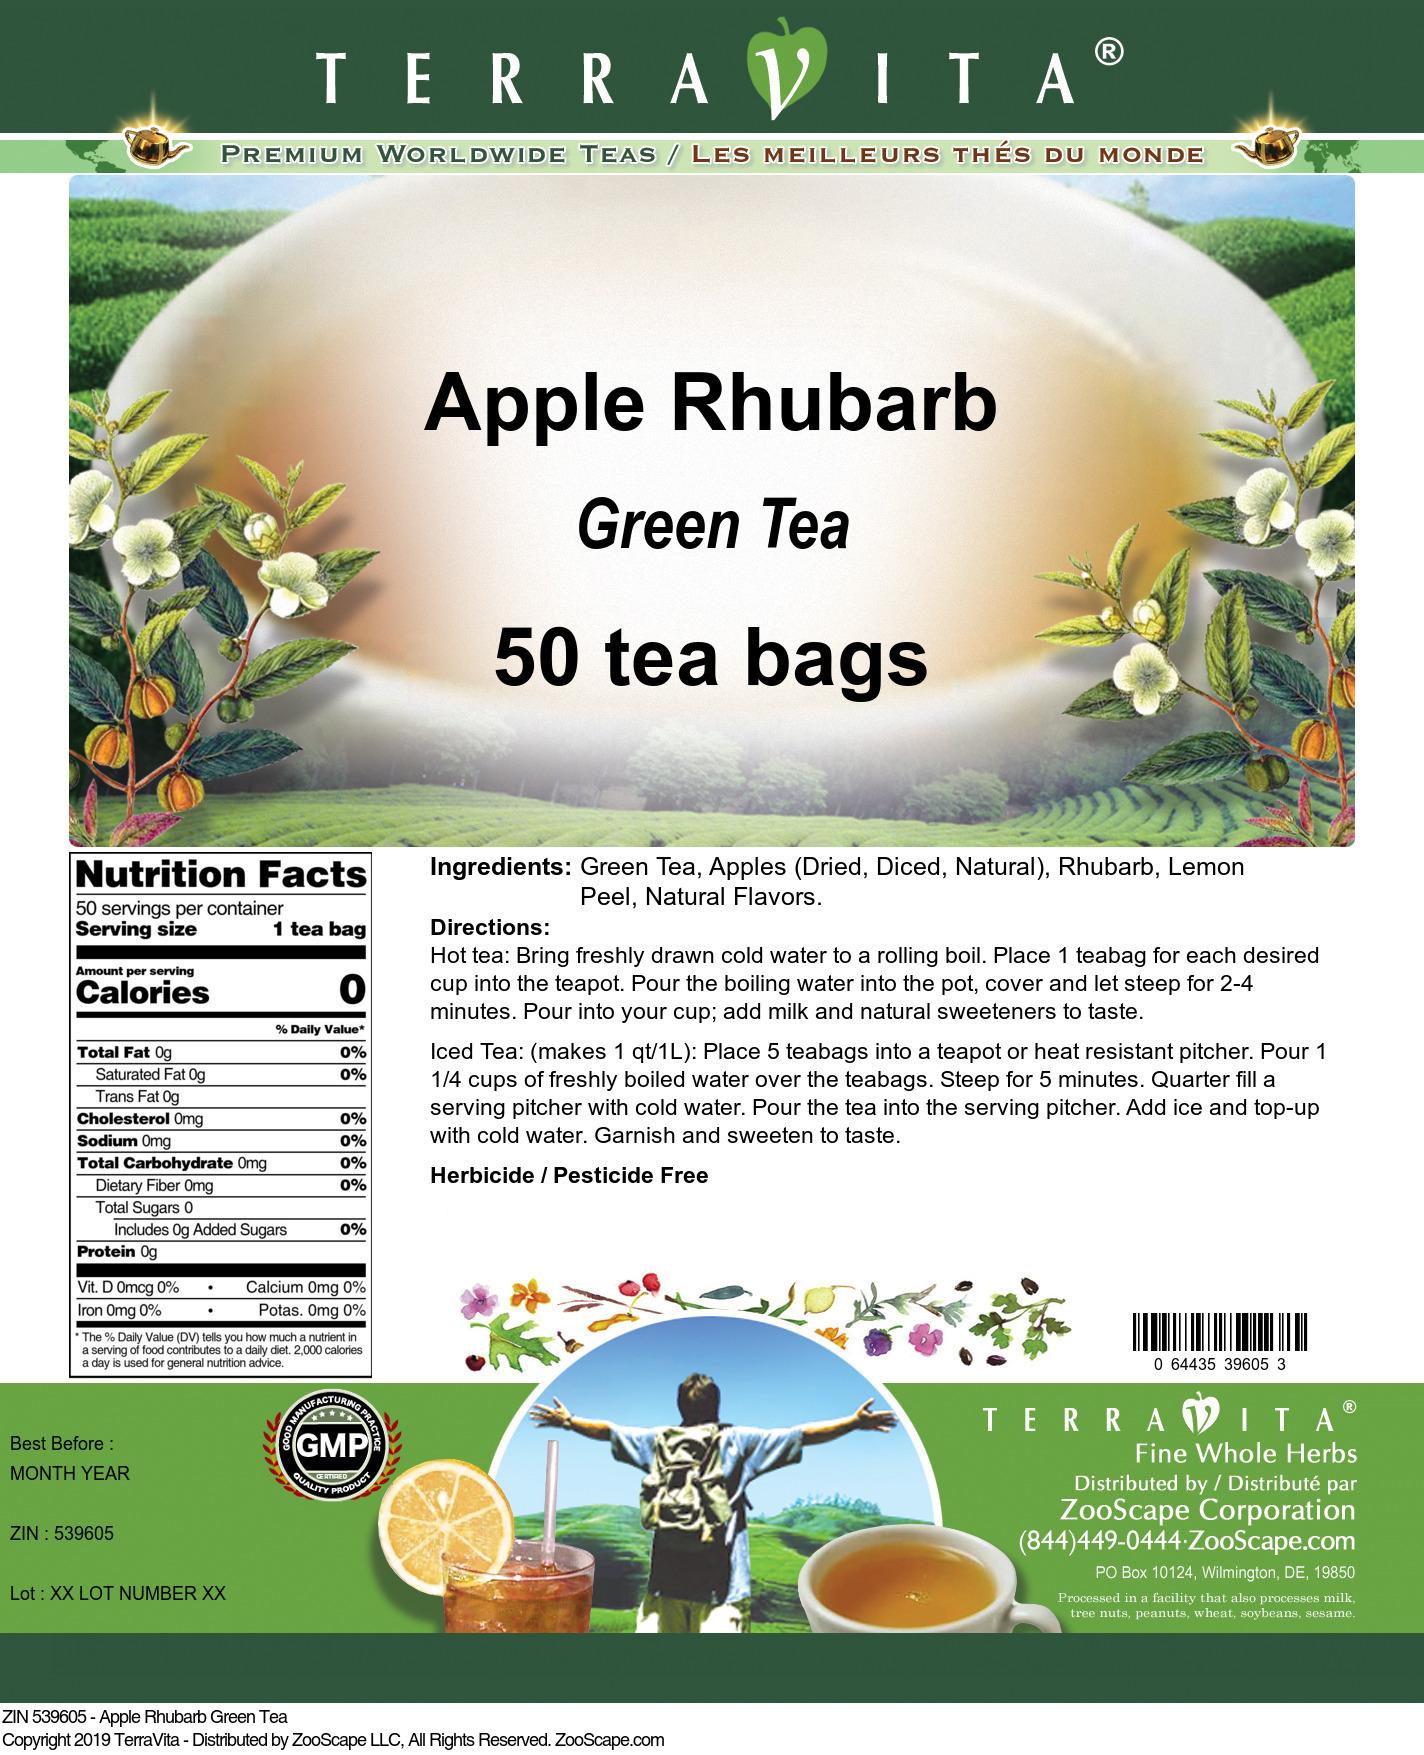 Apple Rhubarb Green Tea